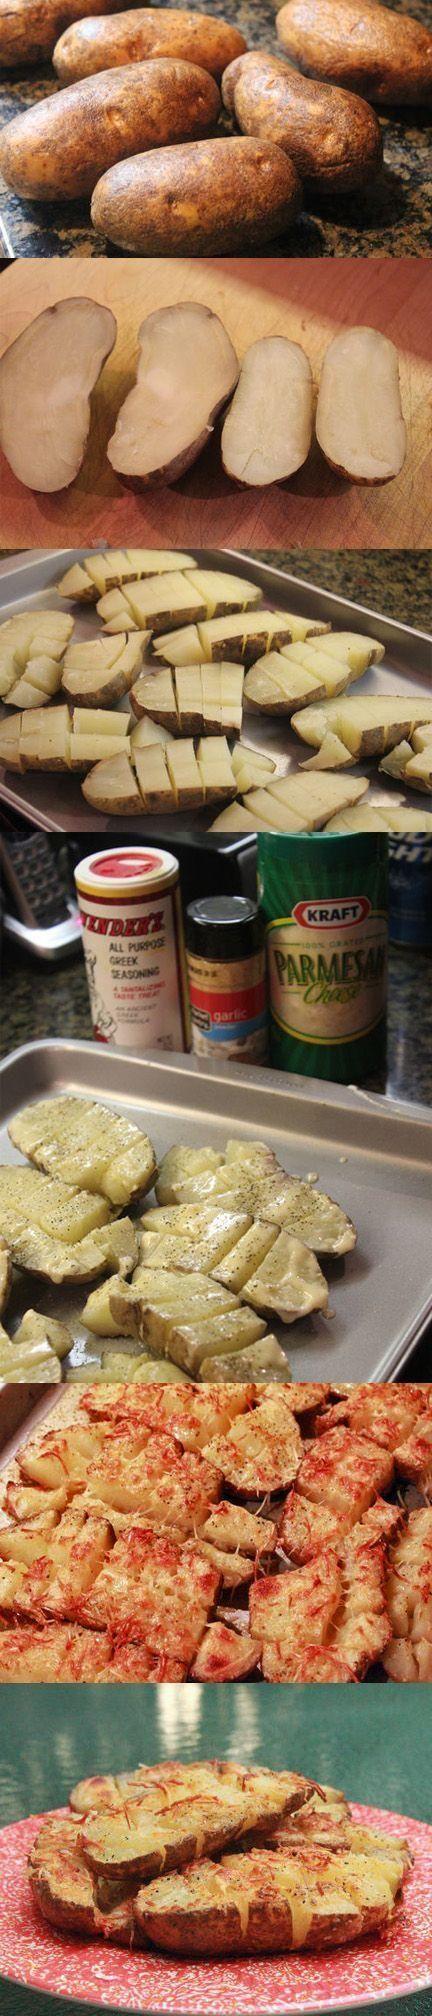 Seasoned Roasted Potatoes - Love with recipe